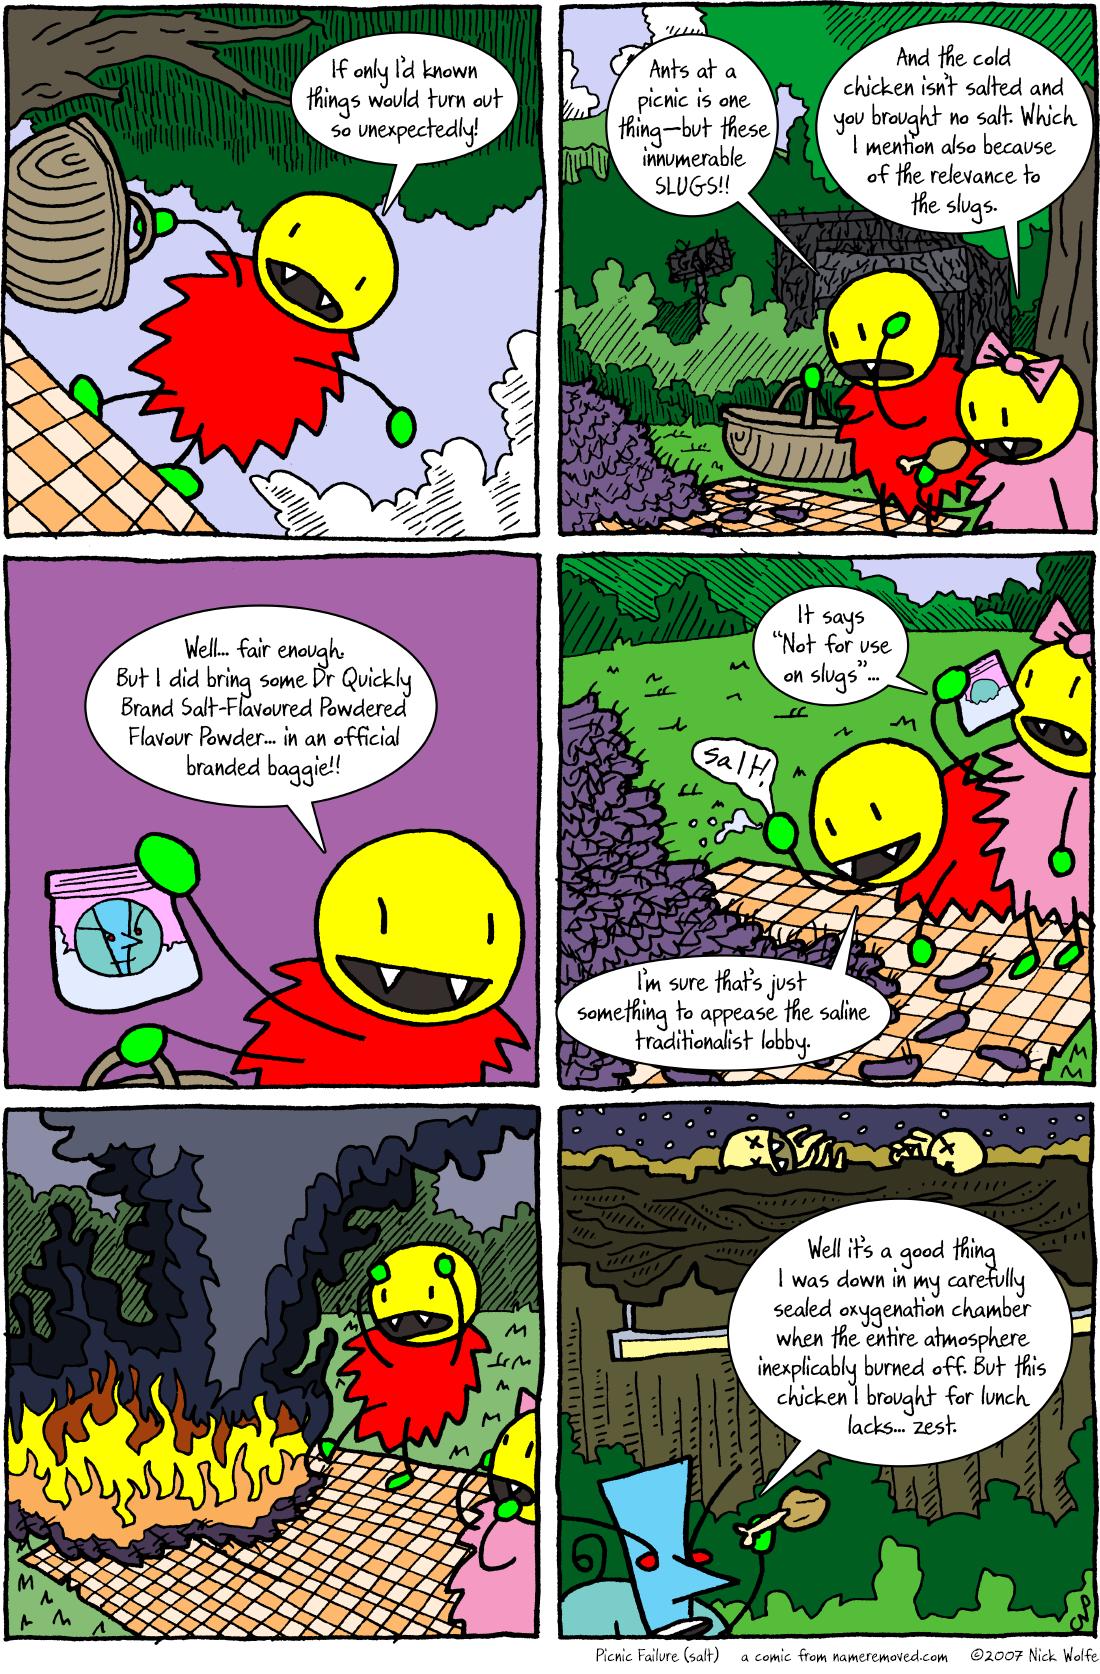 Picnic Failure (salt)